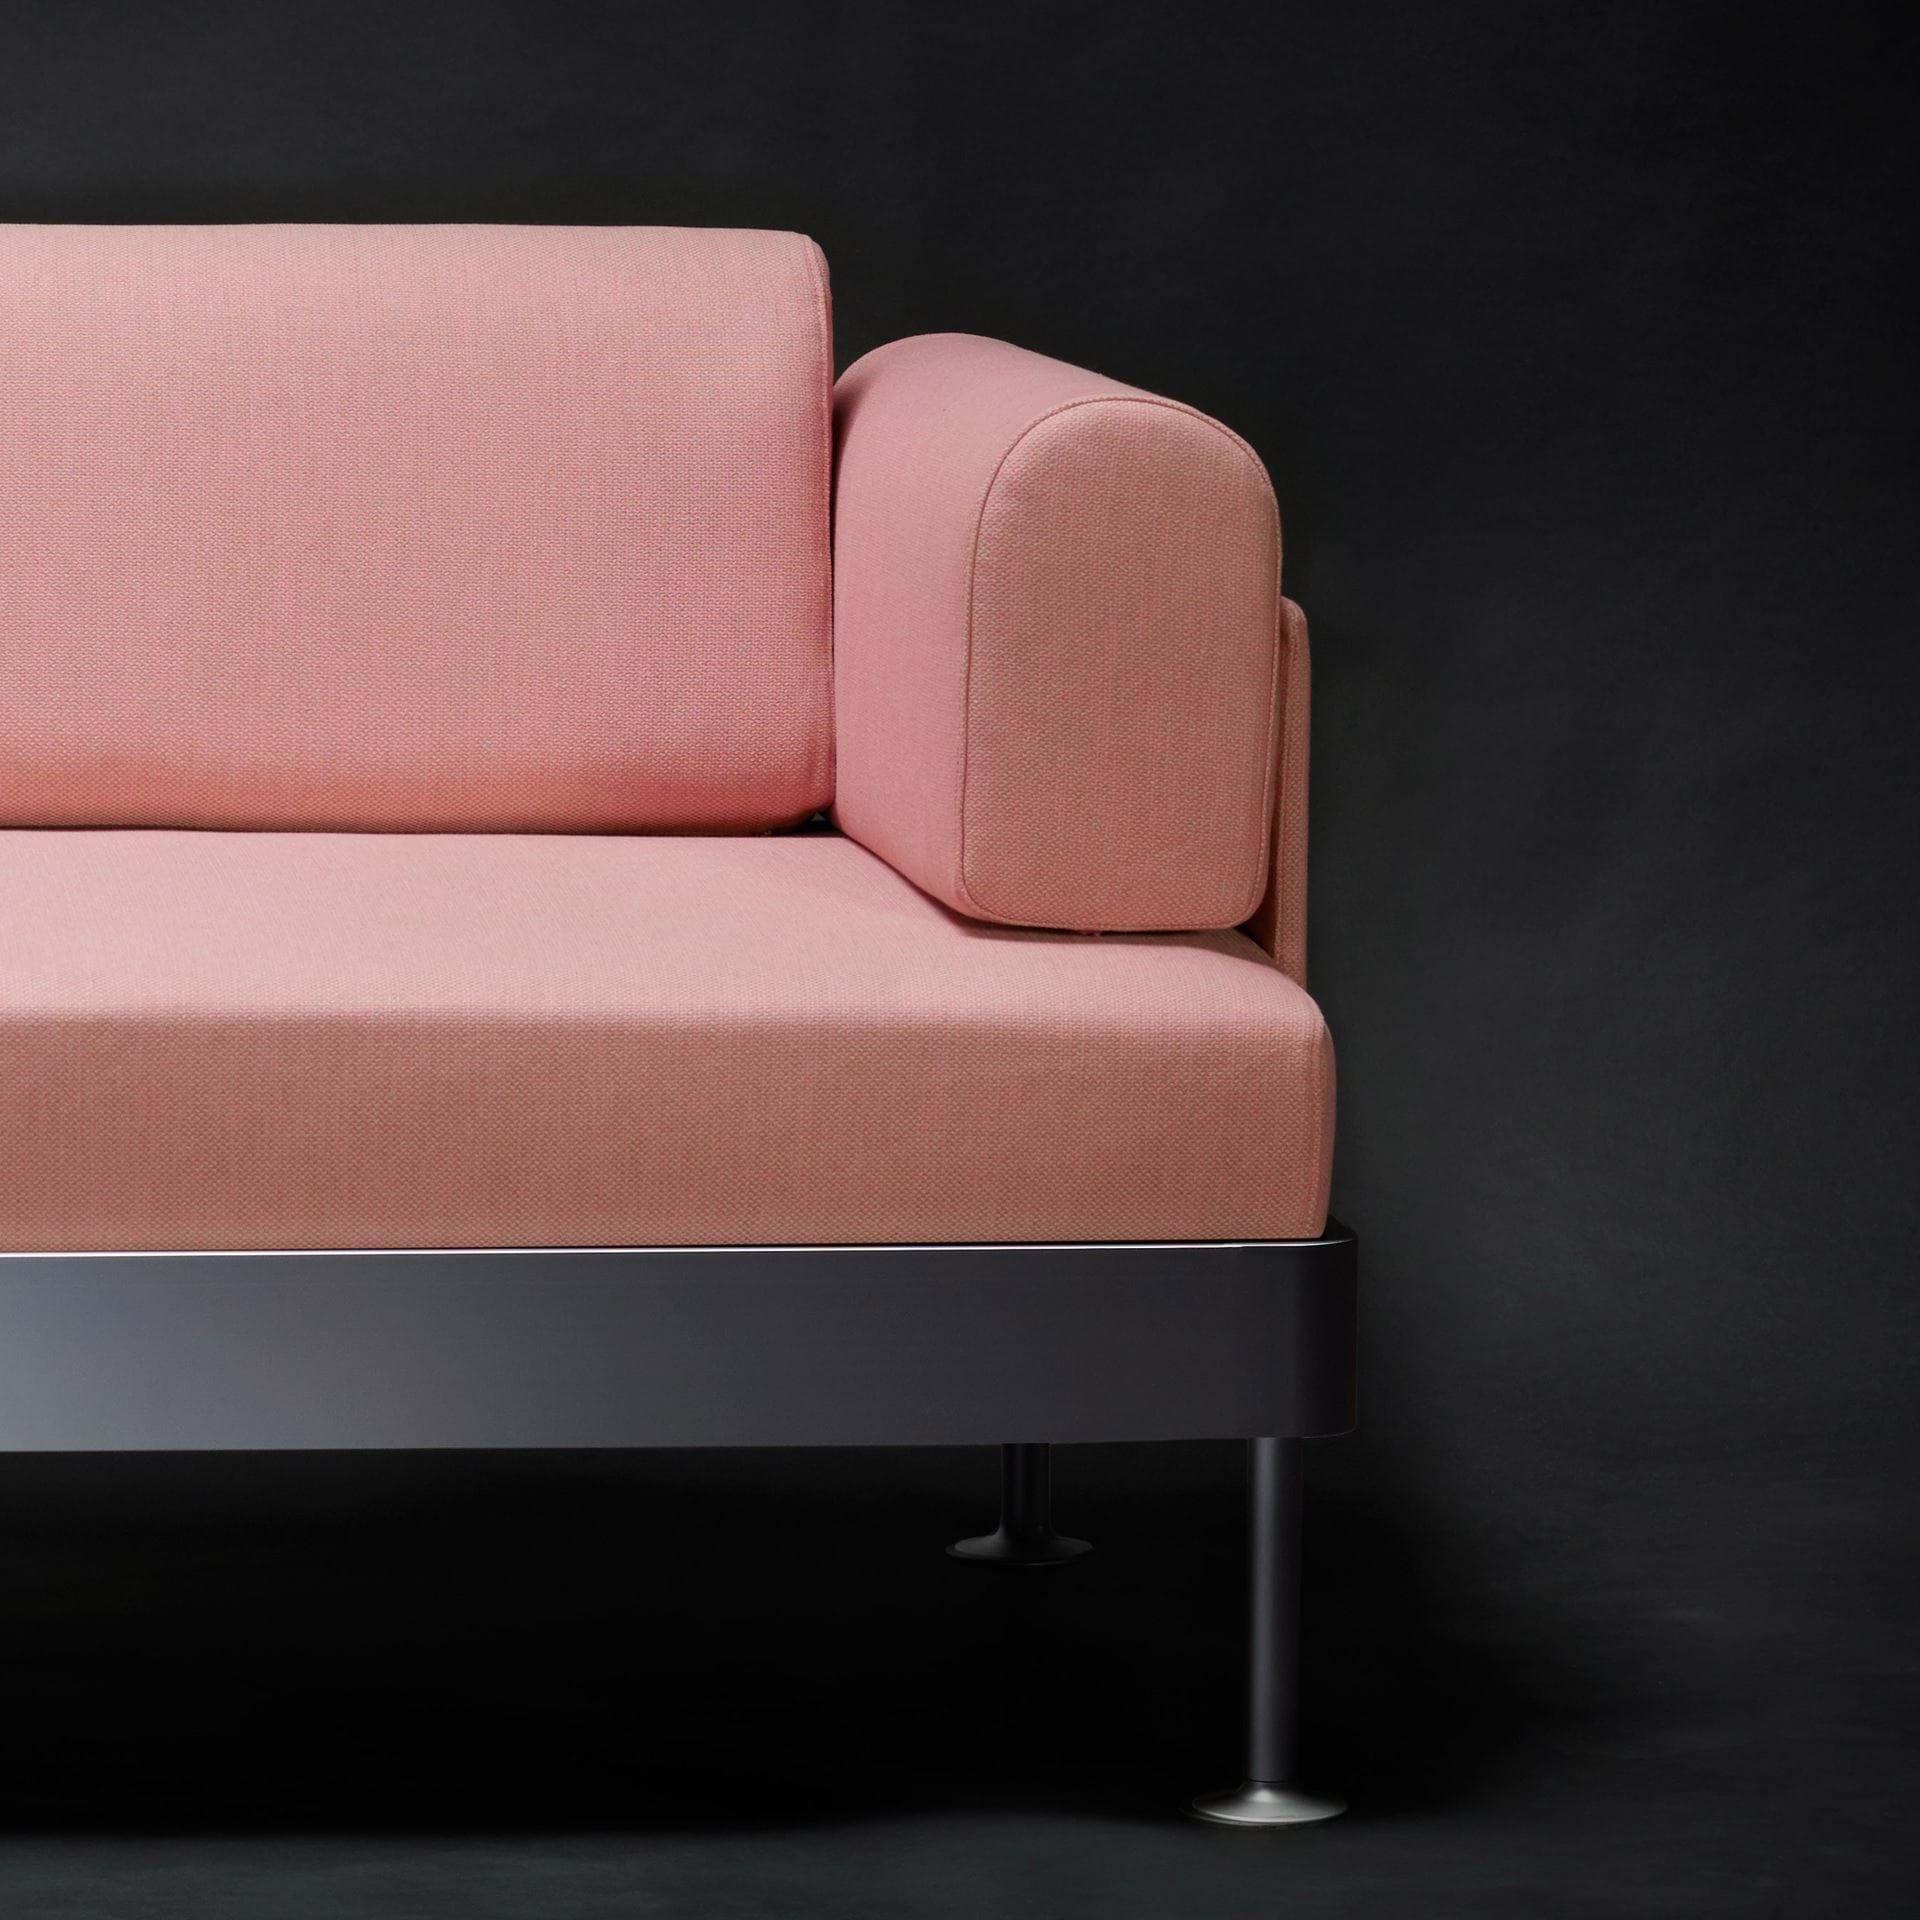 Astounding Delaktig Backrest With Cushion Cover Bemz Unemploymentrelief Wooden Chair Designs For Living Room Unemploymentrelieforg